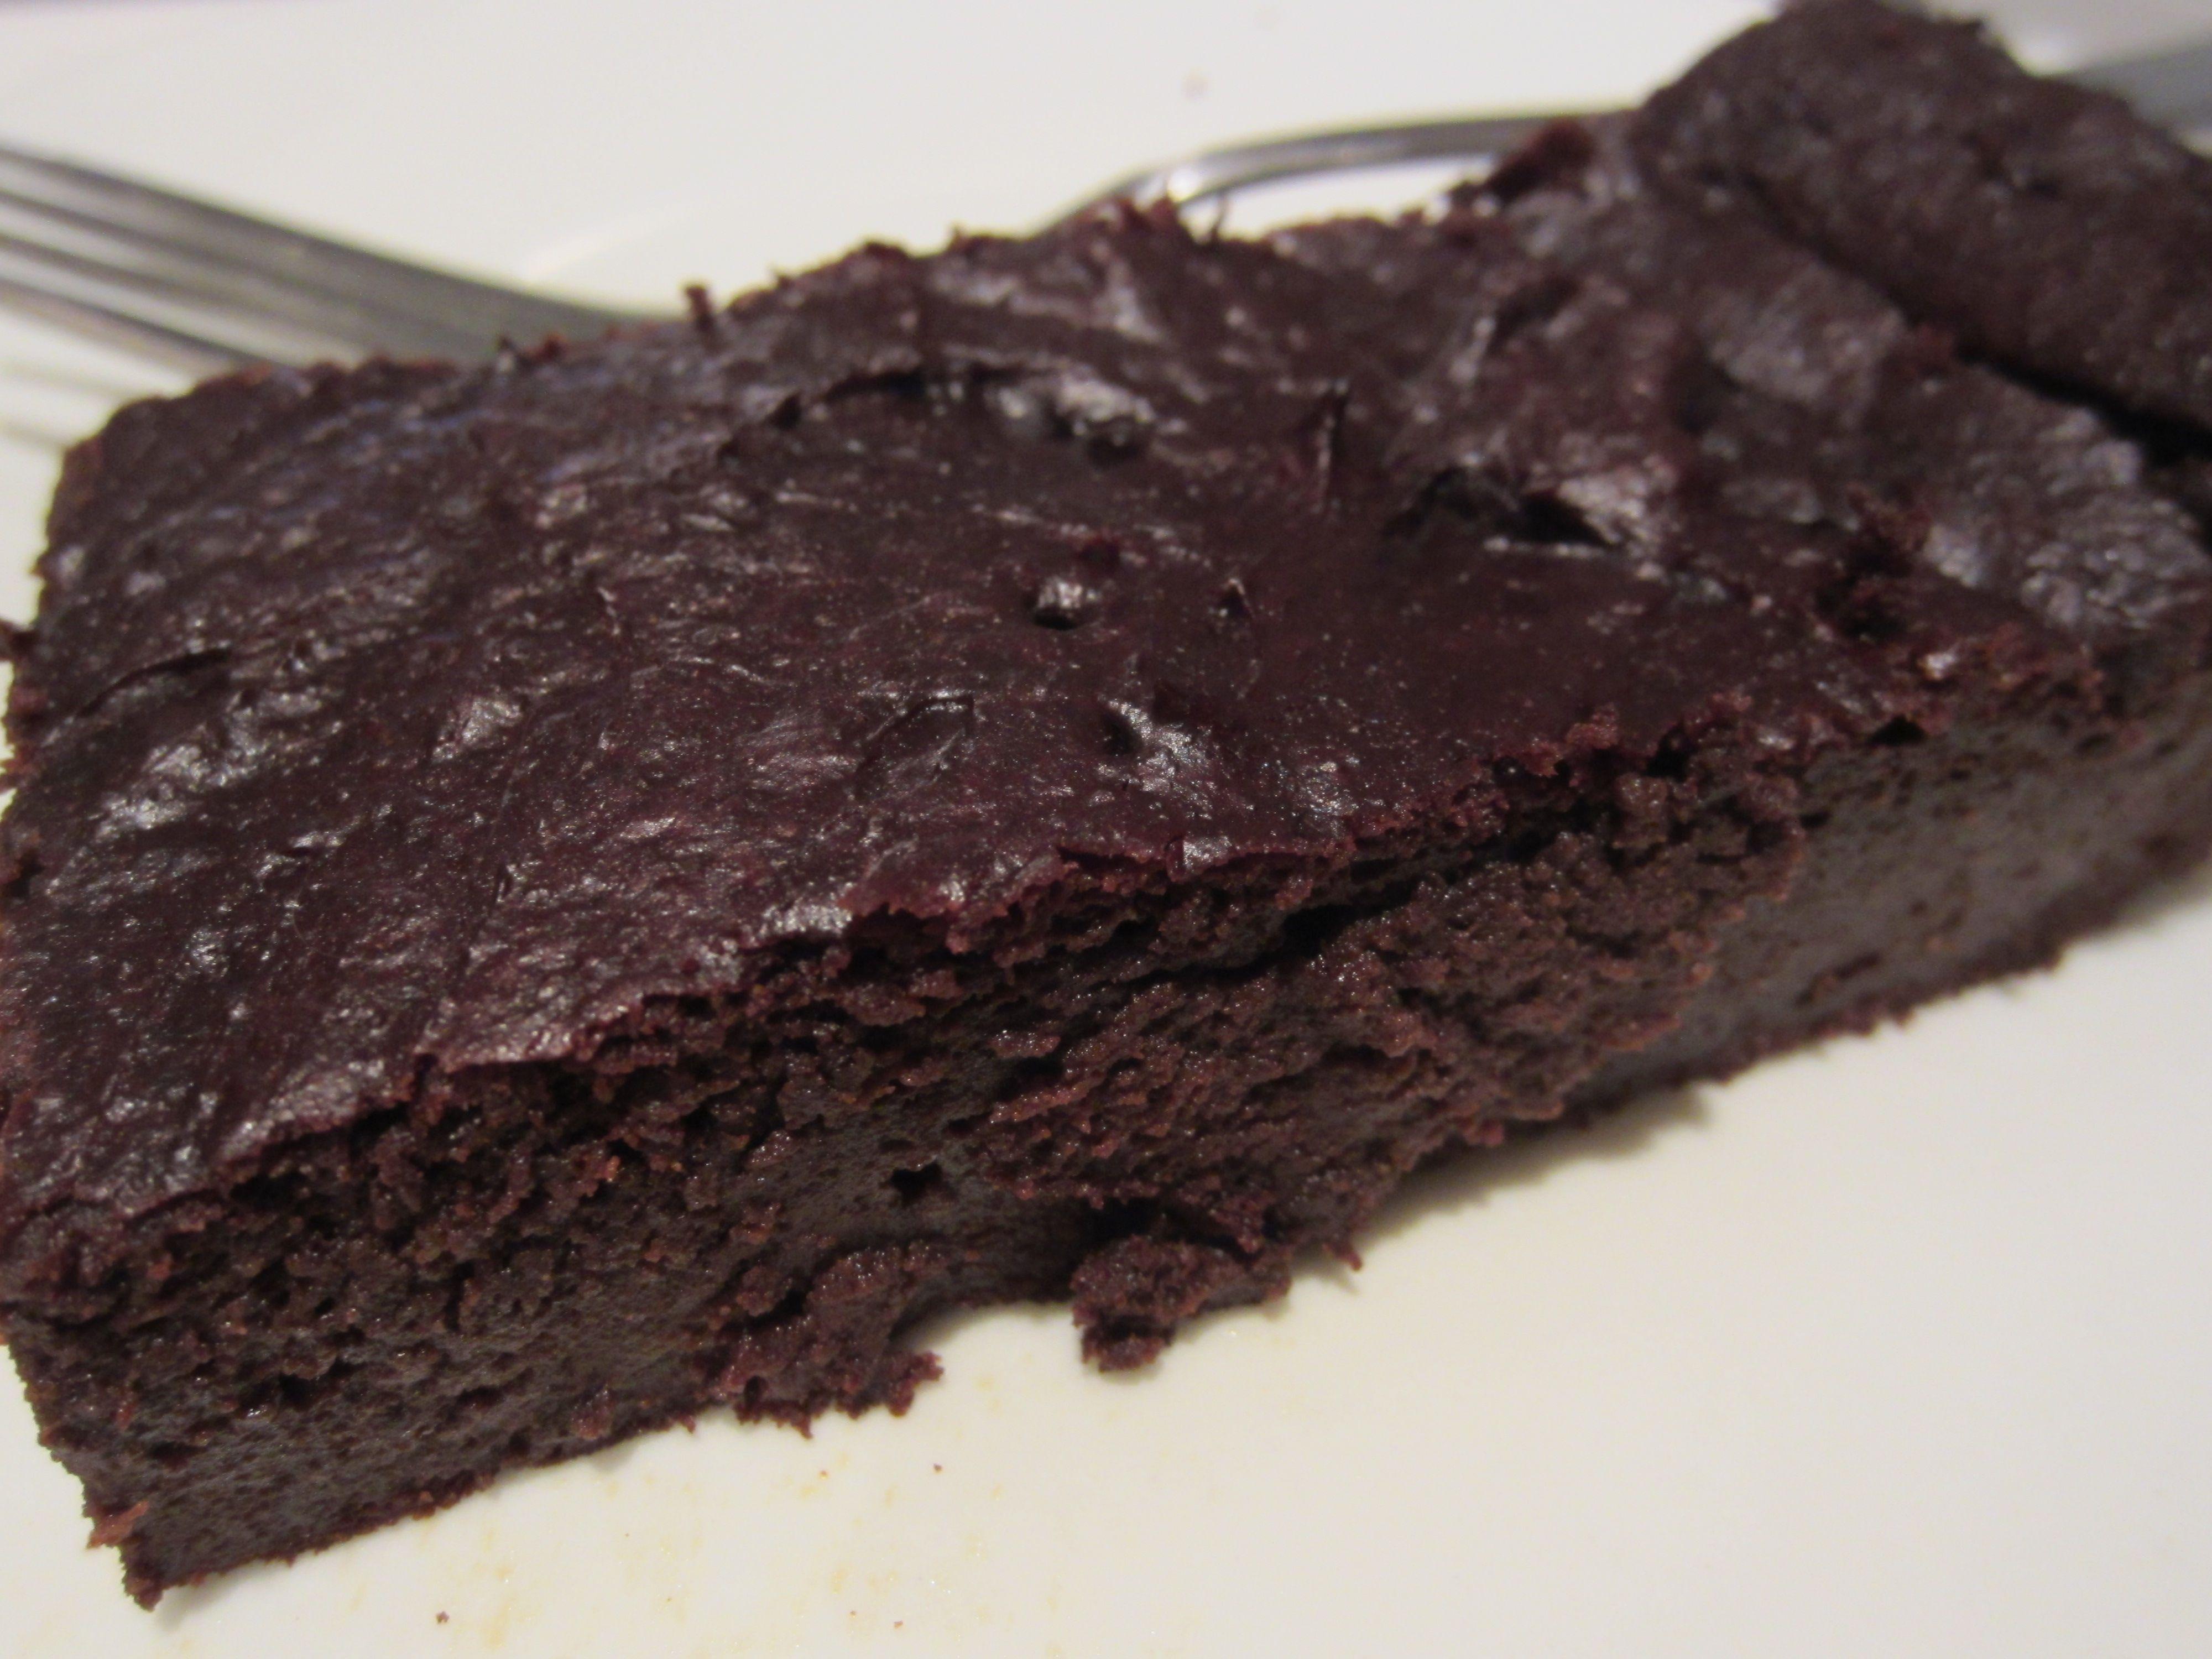 Keto Avocado Cake Recipes: Avocado Brownies - Keto